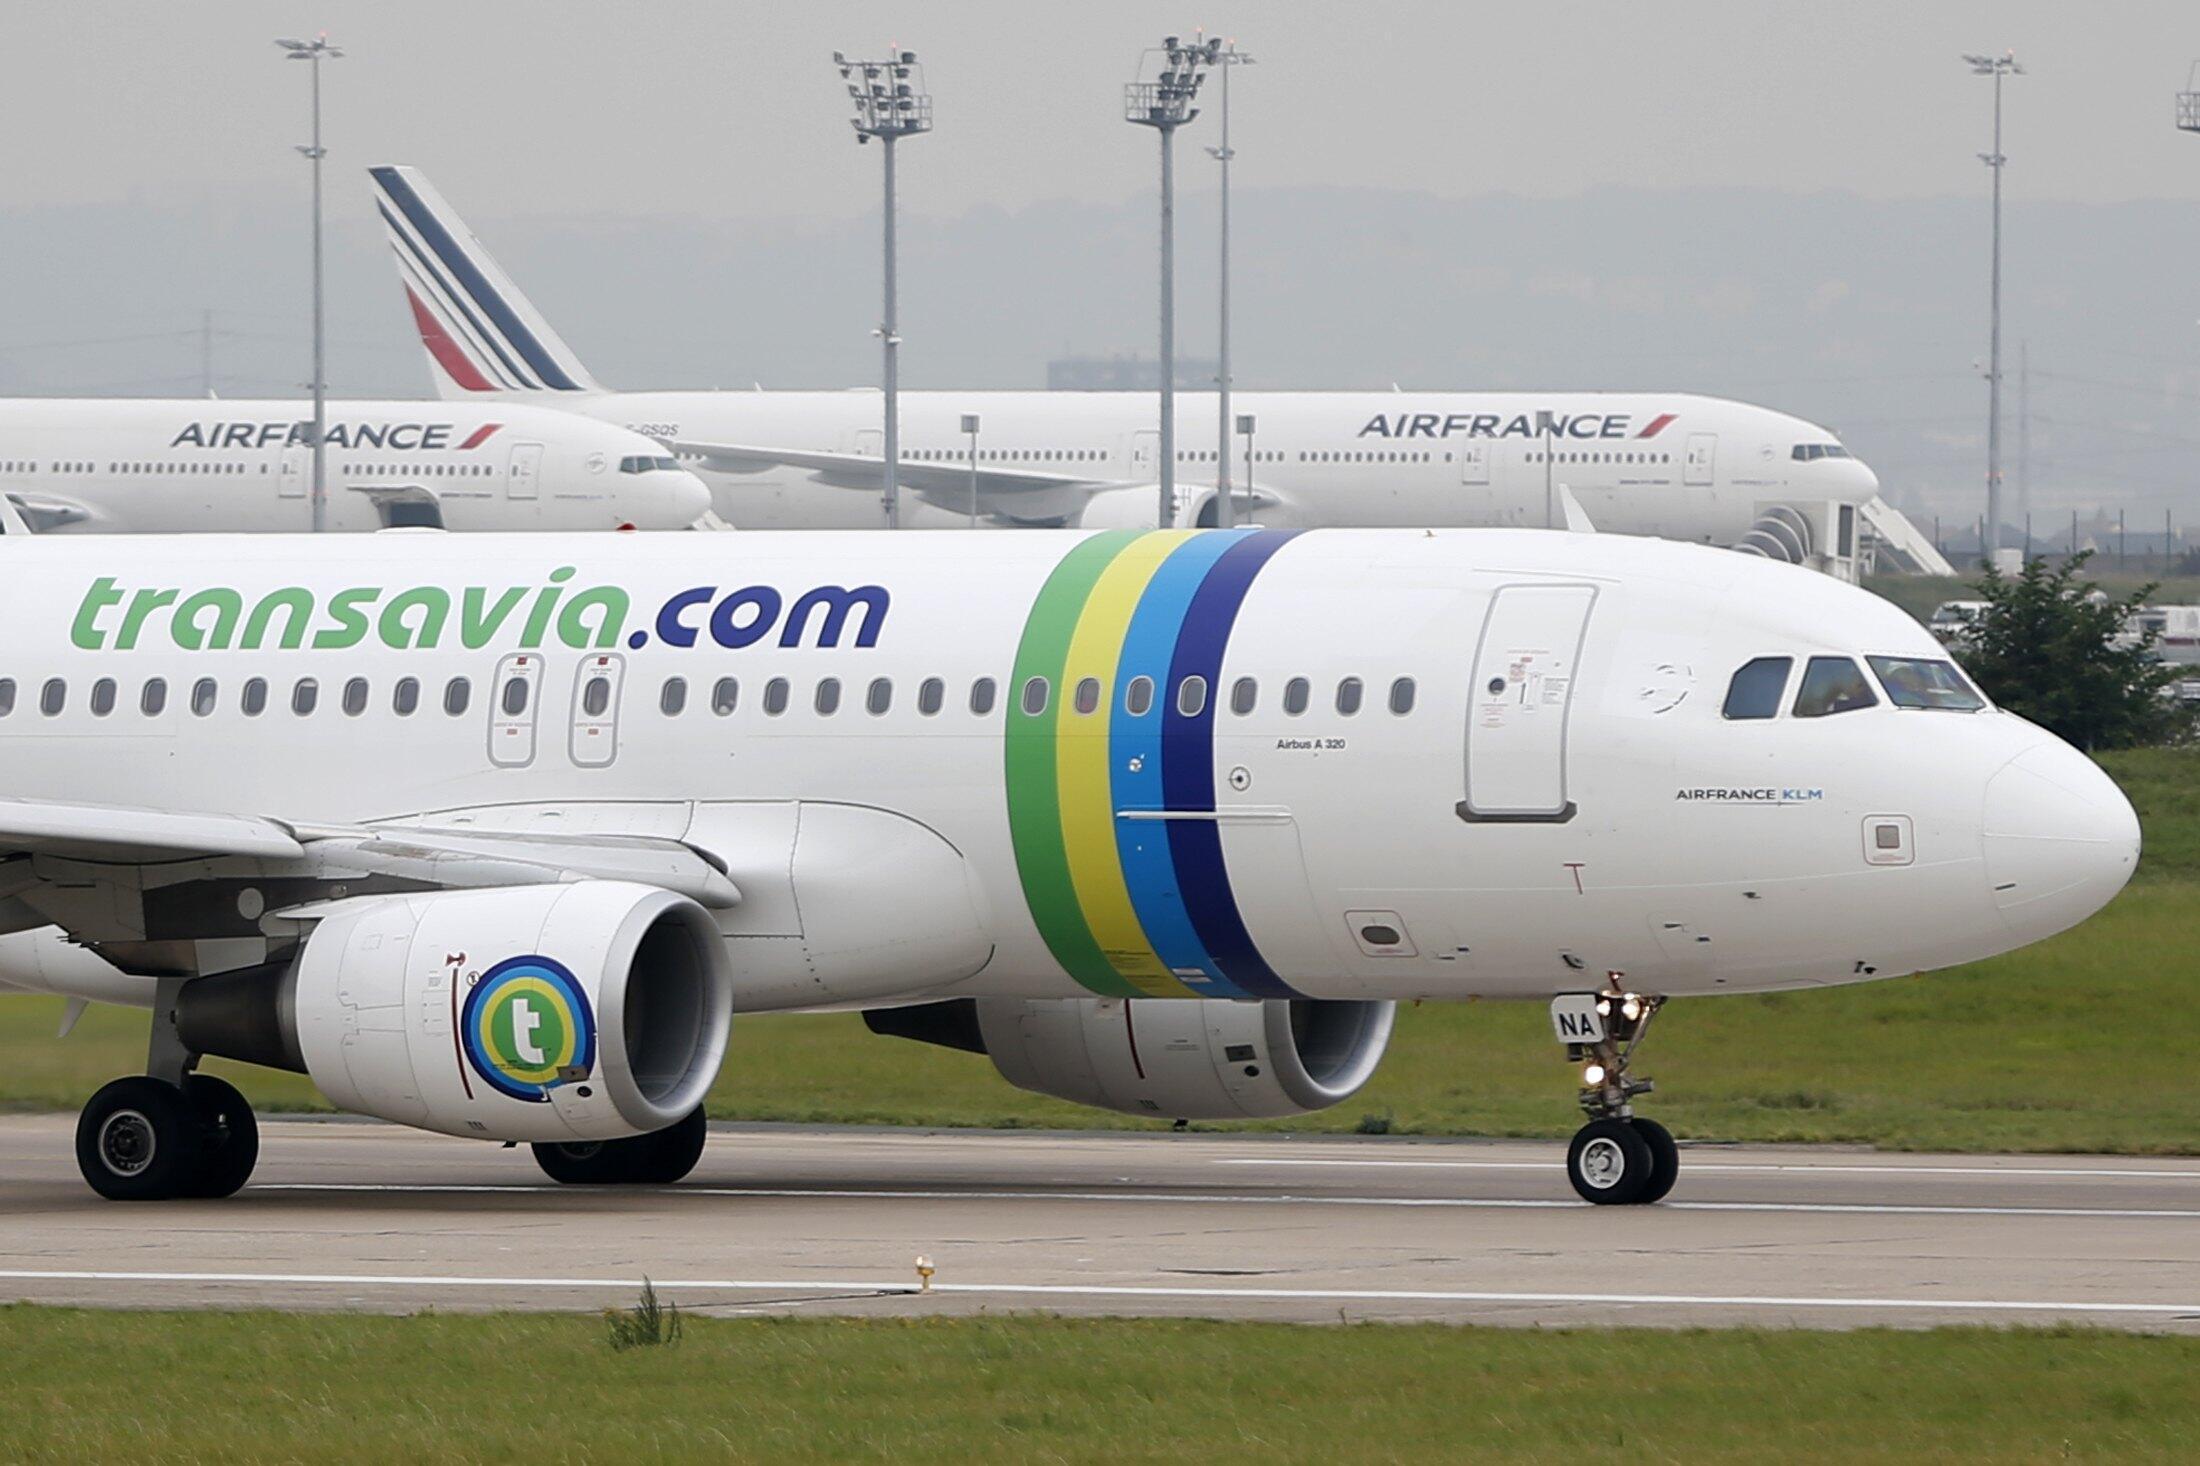 A Transavia Airbus A320 passenger at Paris's Orly airport